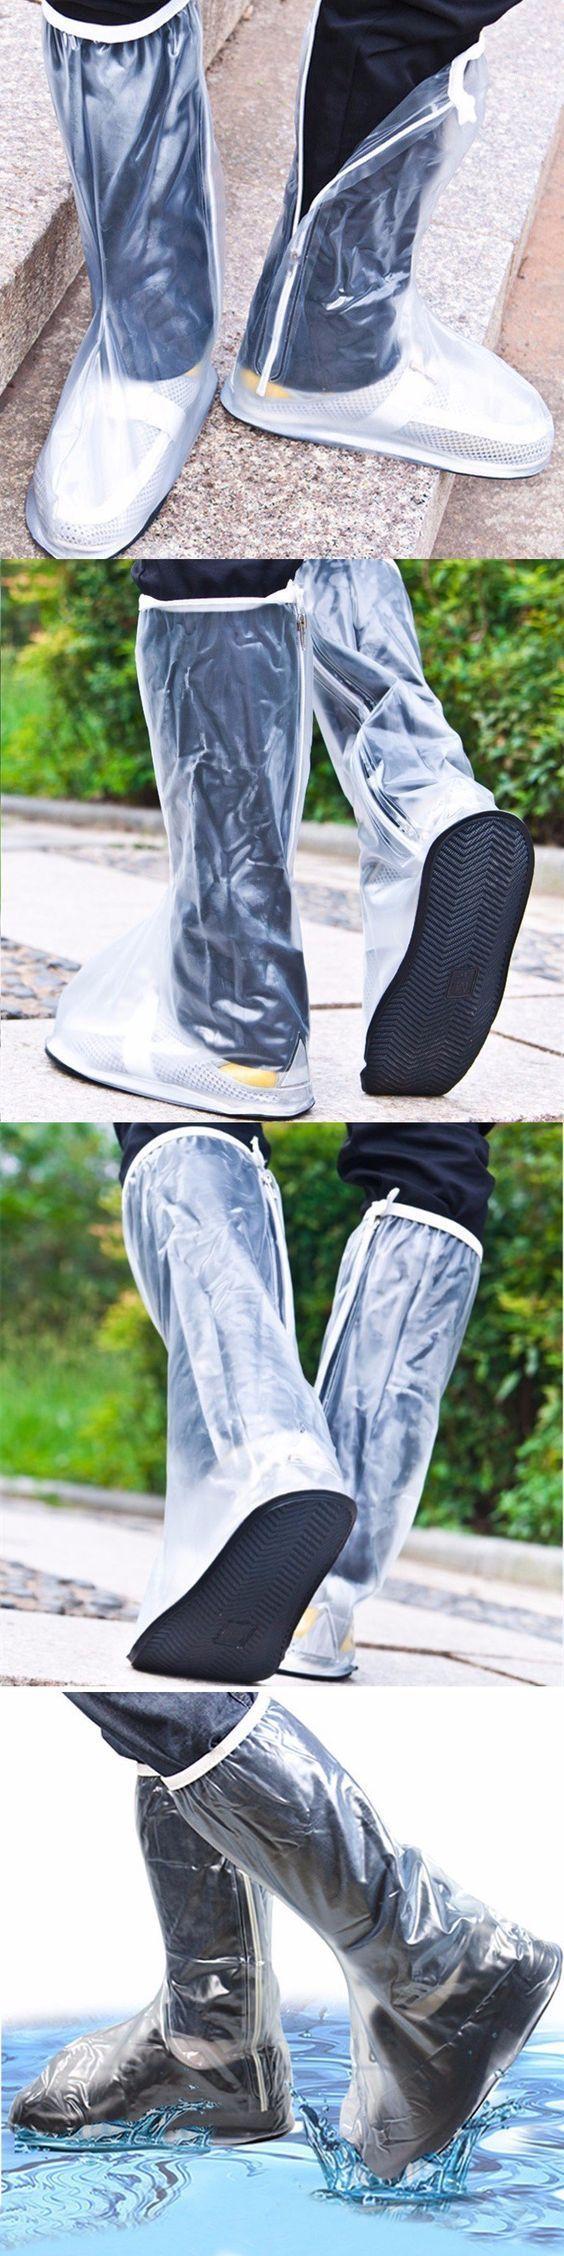 US$8.32 Men Women Rain Shoes Cover Waterproof High Boots Flats Slip-resistant Overshoes Rain Gear